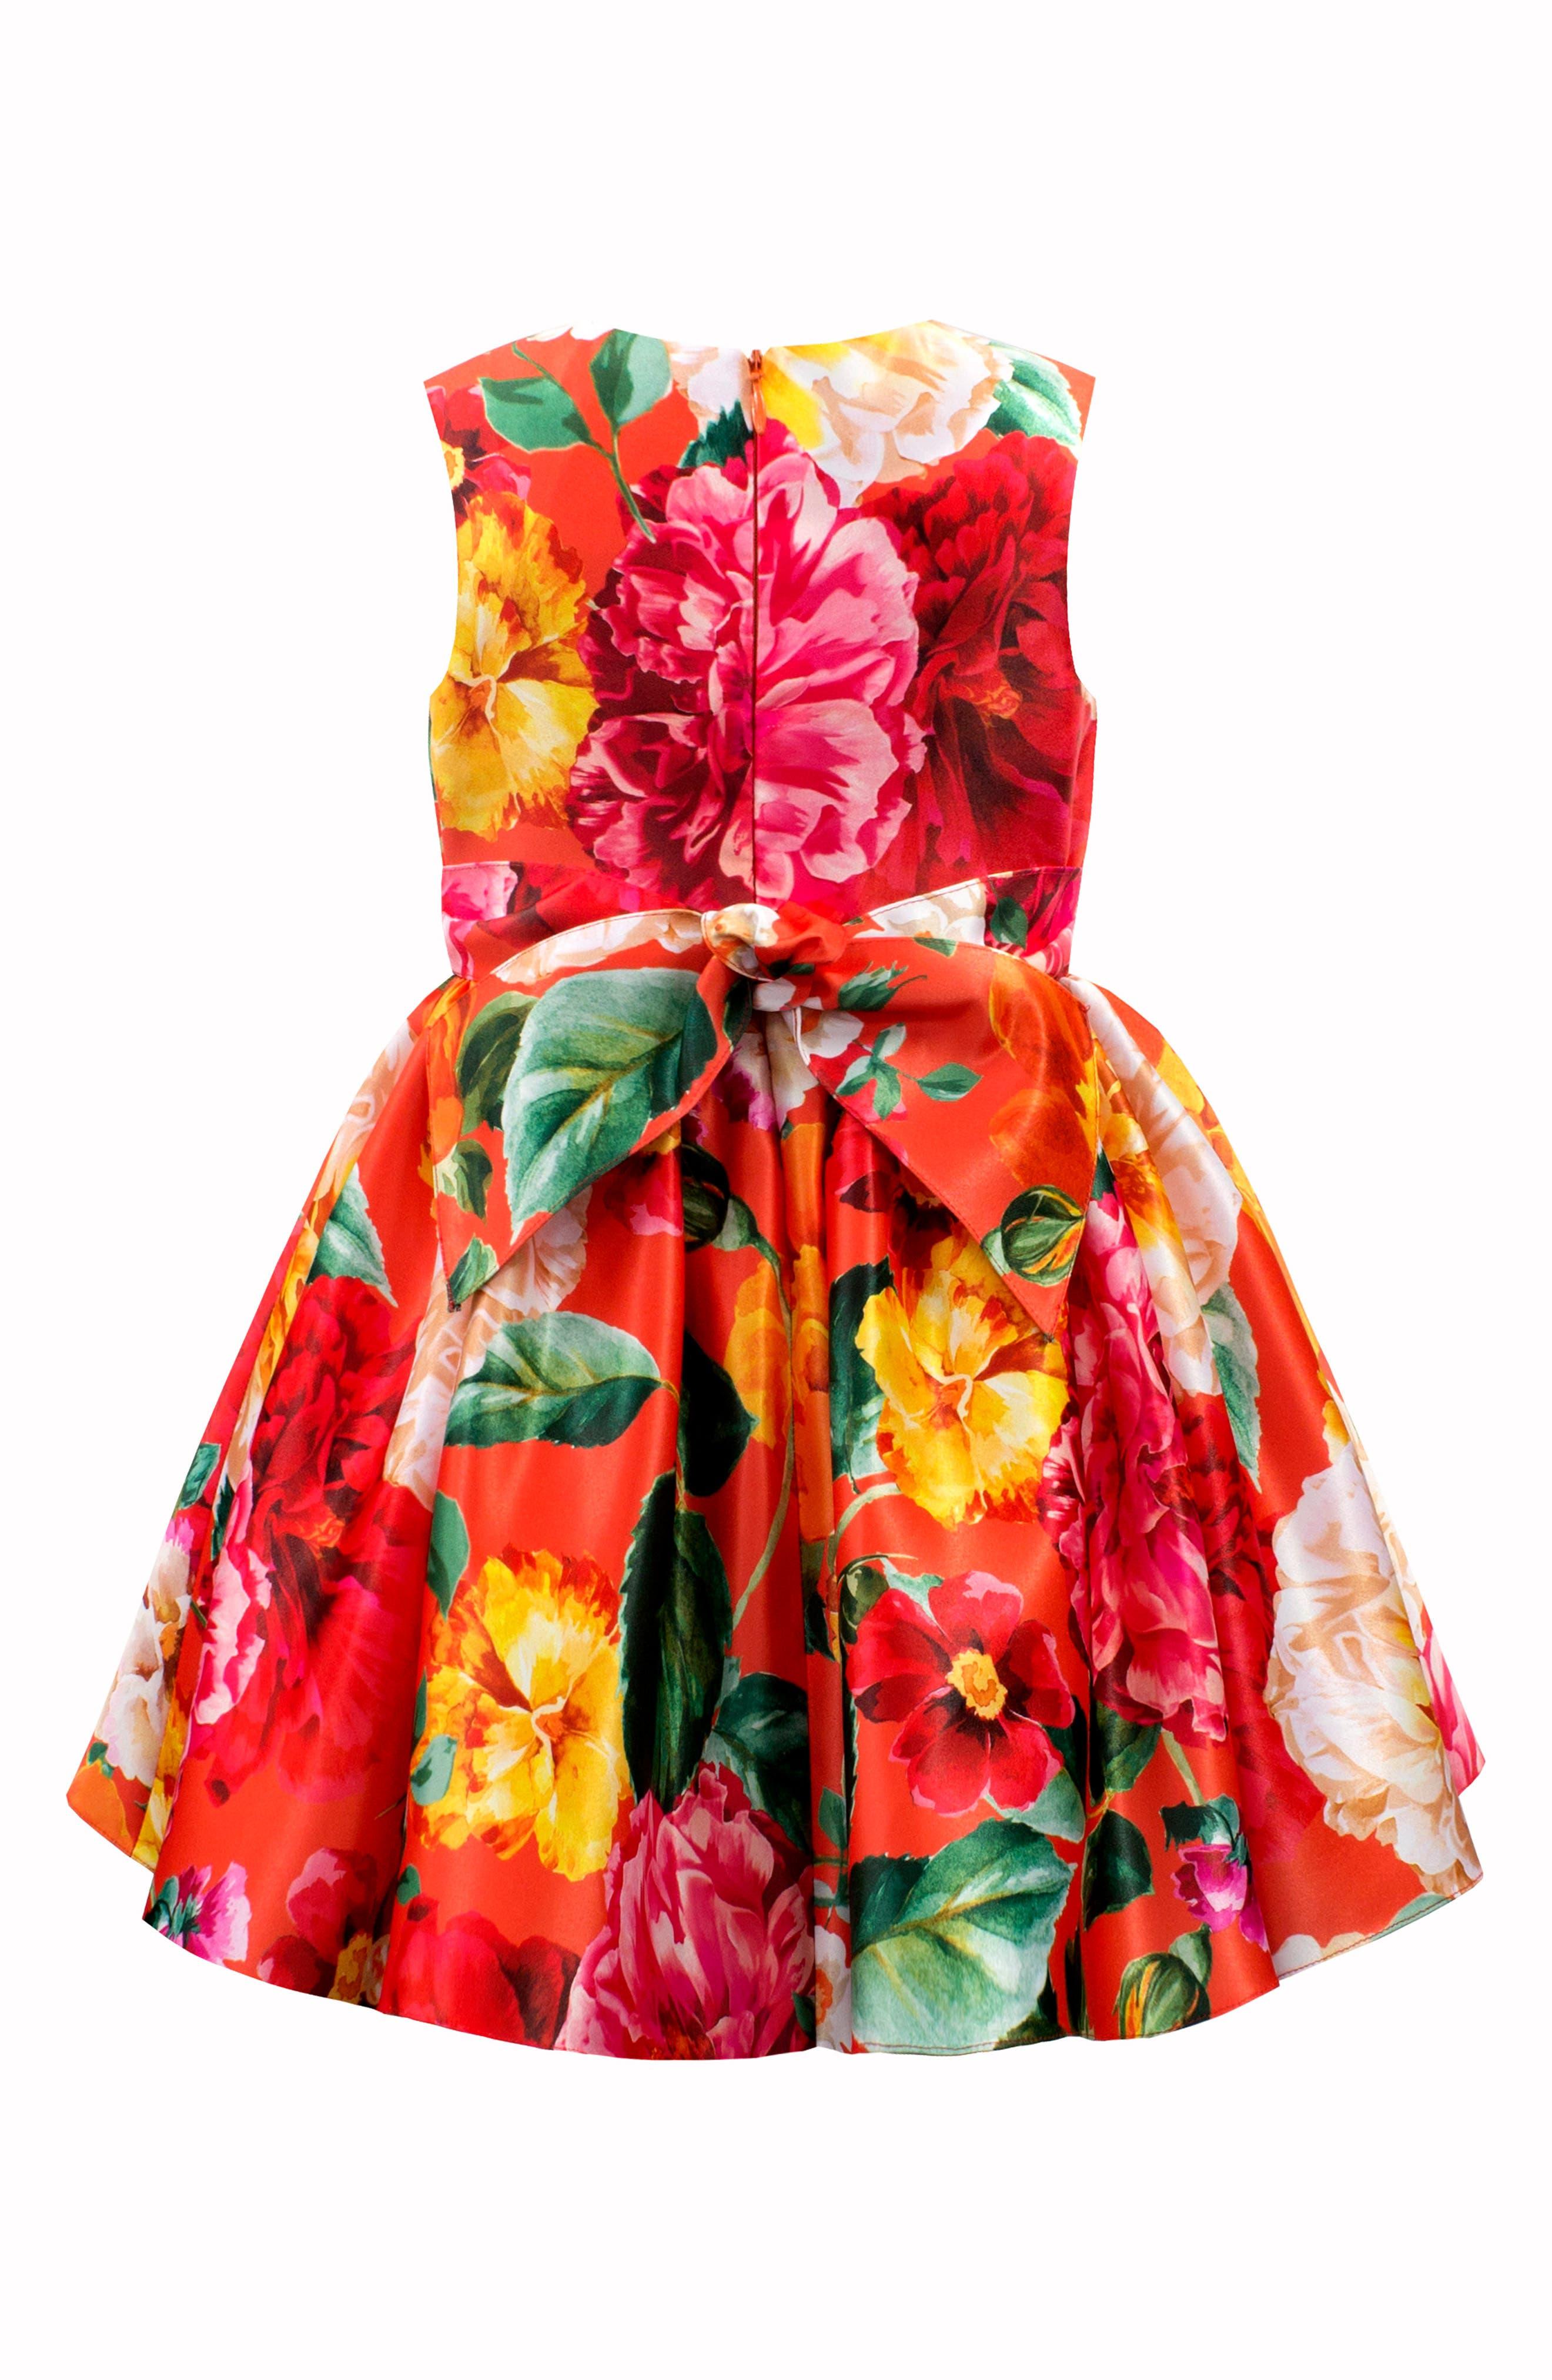 DAVID CHARLES,                             Floral Print Frilled Satin Party Dress,                             Alternate thumbnail 2, color,                             ORANGE